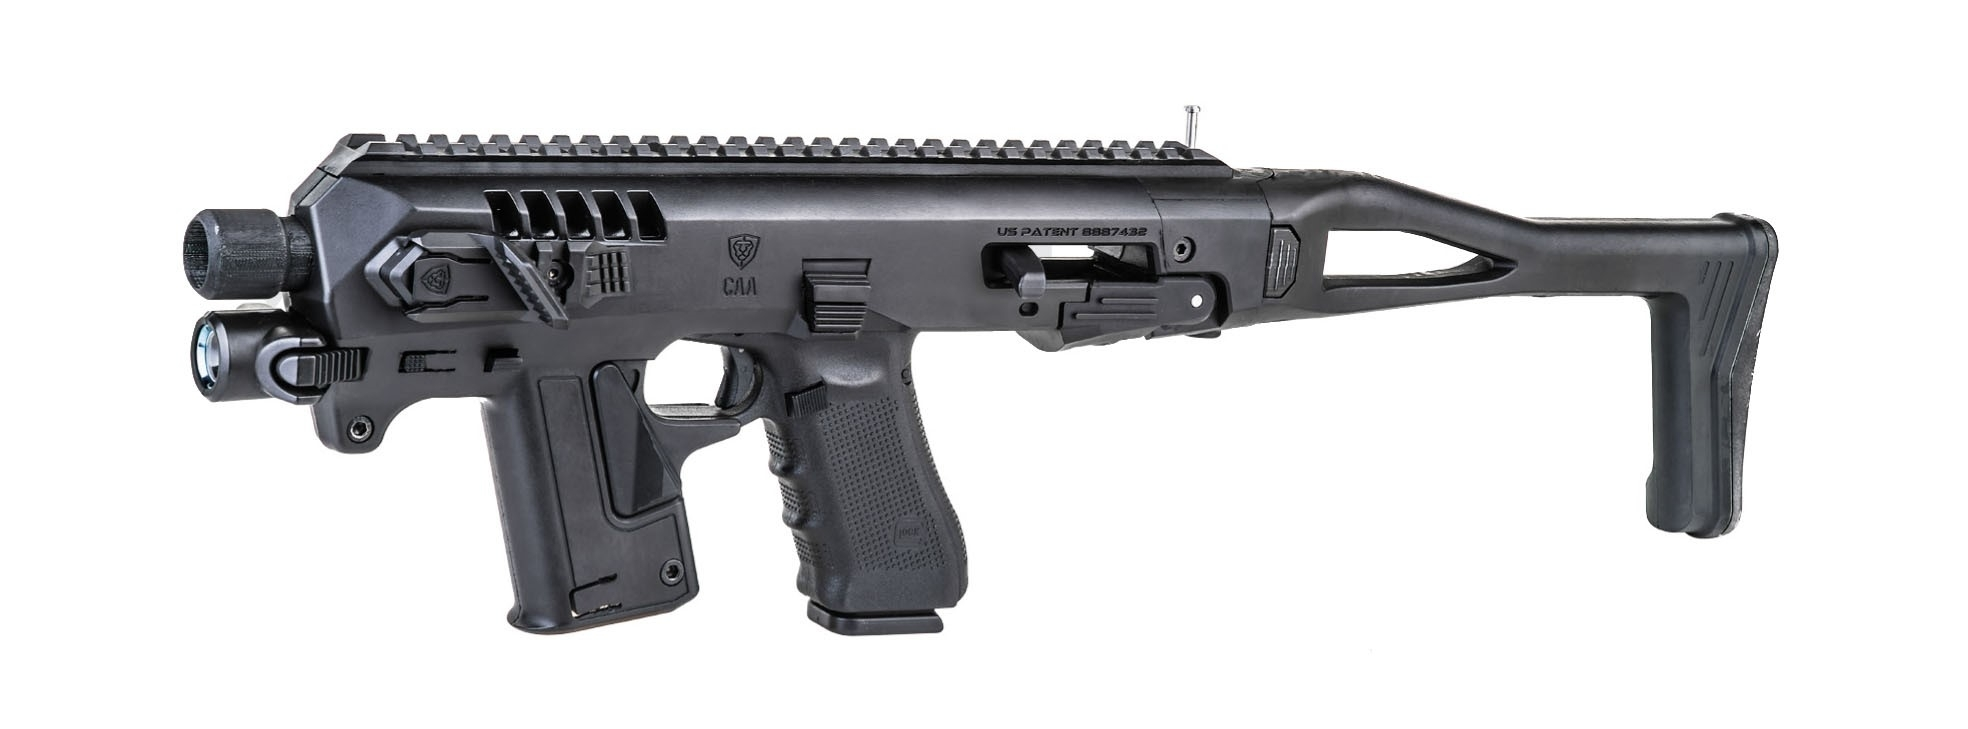 STARSHOOTER | Glock und MICRO RONI System Glock 19 / 23 / 25 /32 ...